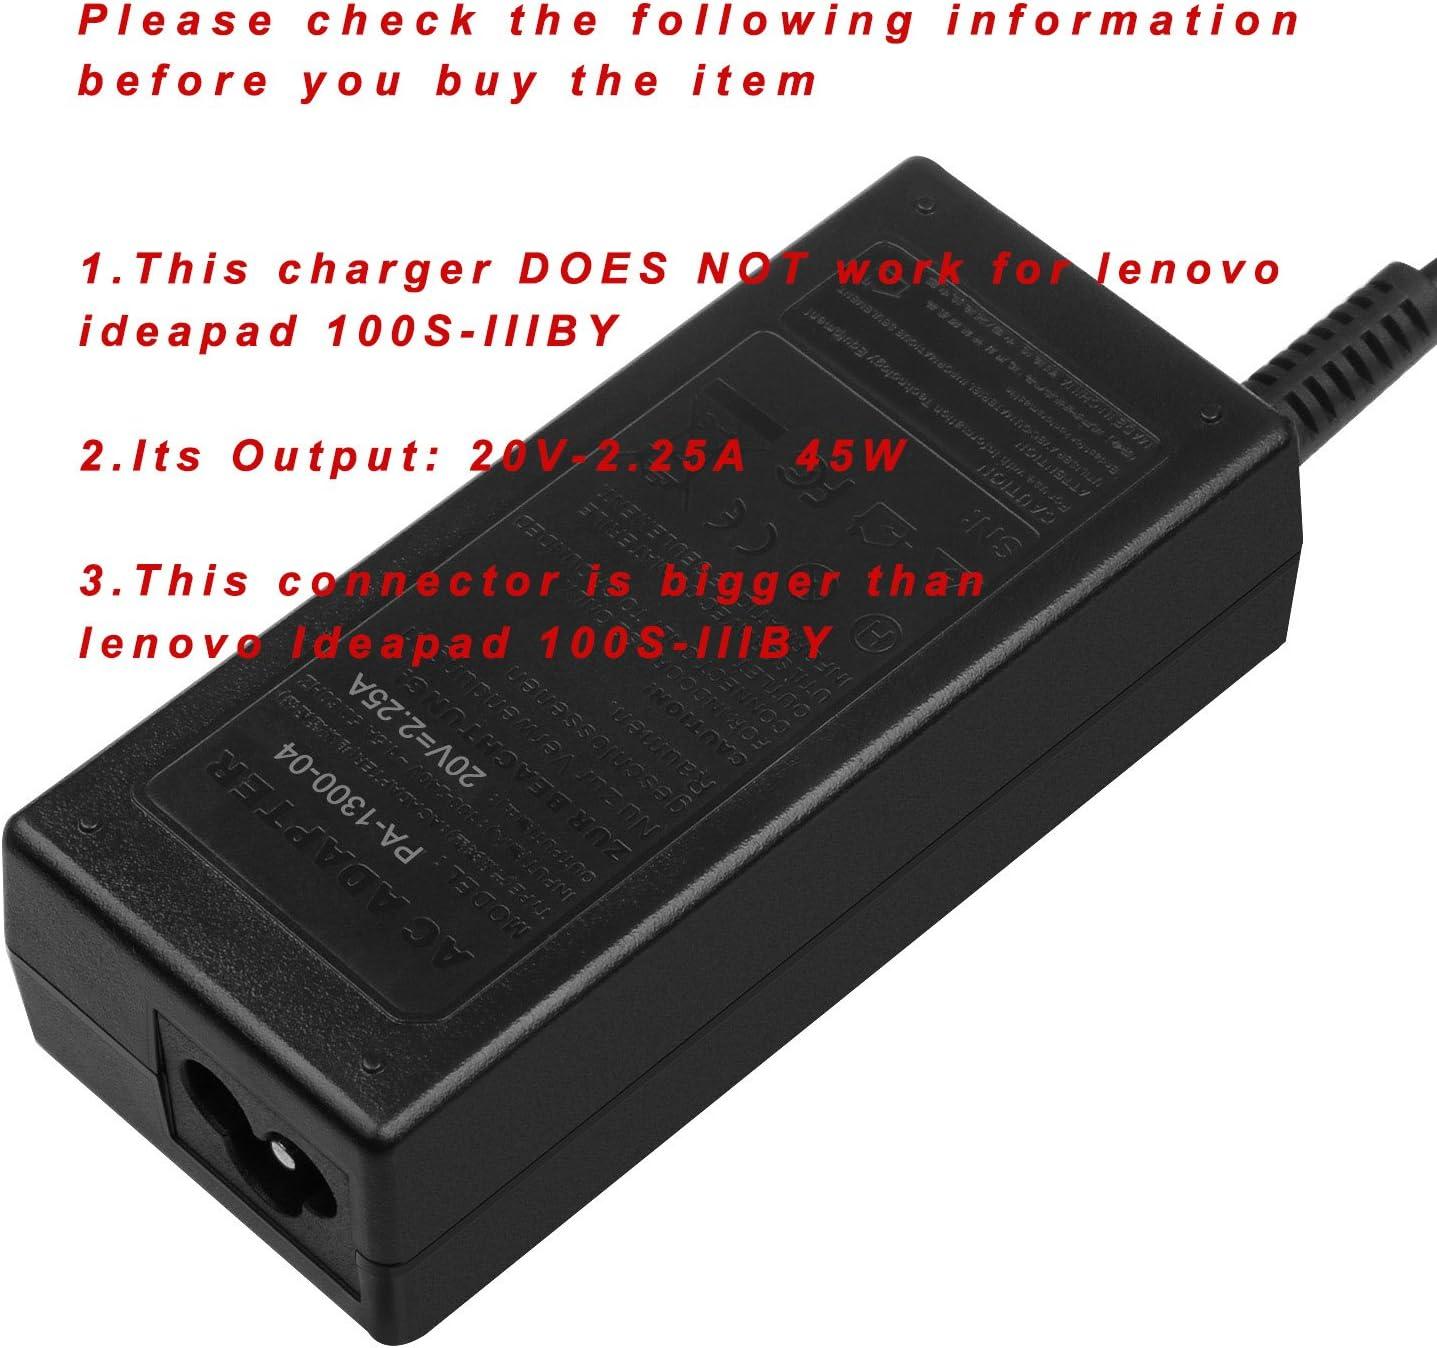 N22 120s 320s 110s 720s; 81CW 81CX; Lenovo Chromebook-100s 80QN 510s N23 310 510 20V 45W Charger for Lenovo-Ideapad 710 N42; Lenovo Yoga 710 11 14 15; Flex 4 1130 1470 320 100 710s 110